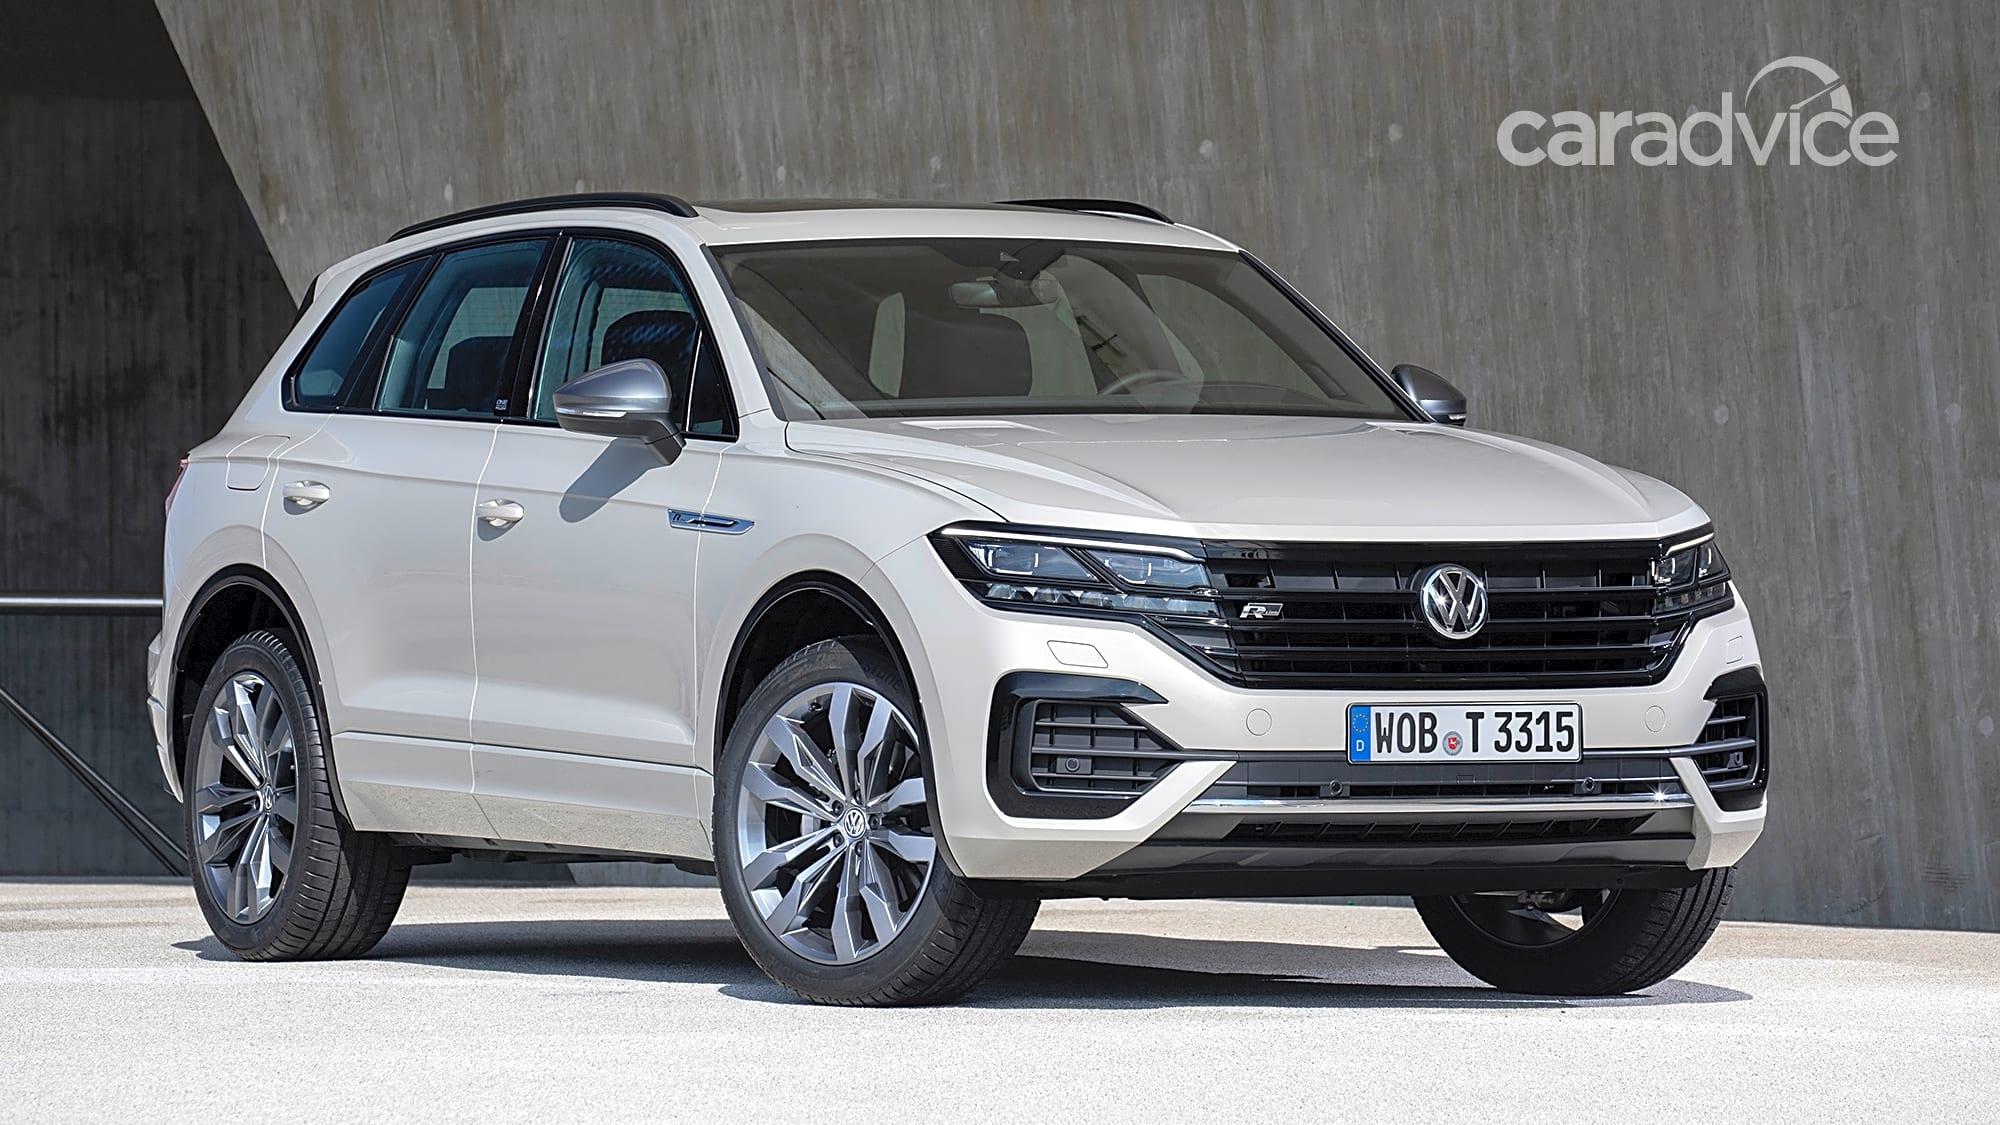 2018 - [Volkswagen] Touareg III - Page 9 Wv6dadaxt485x90ek7av